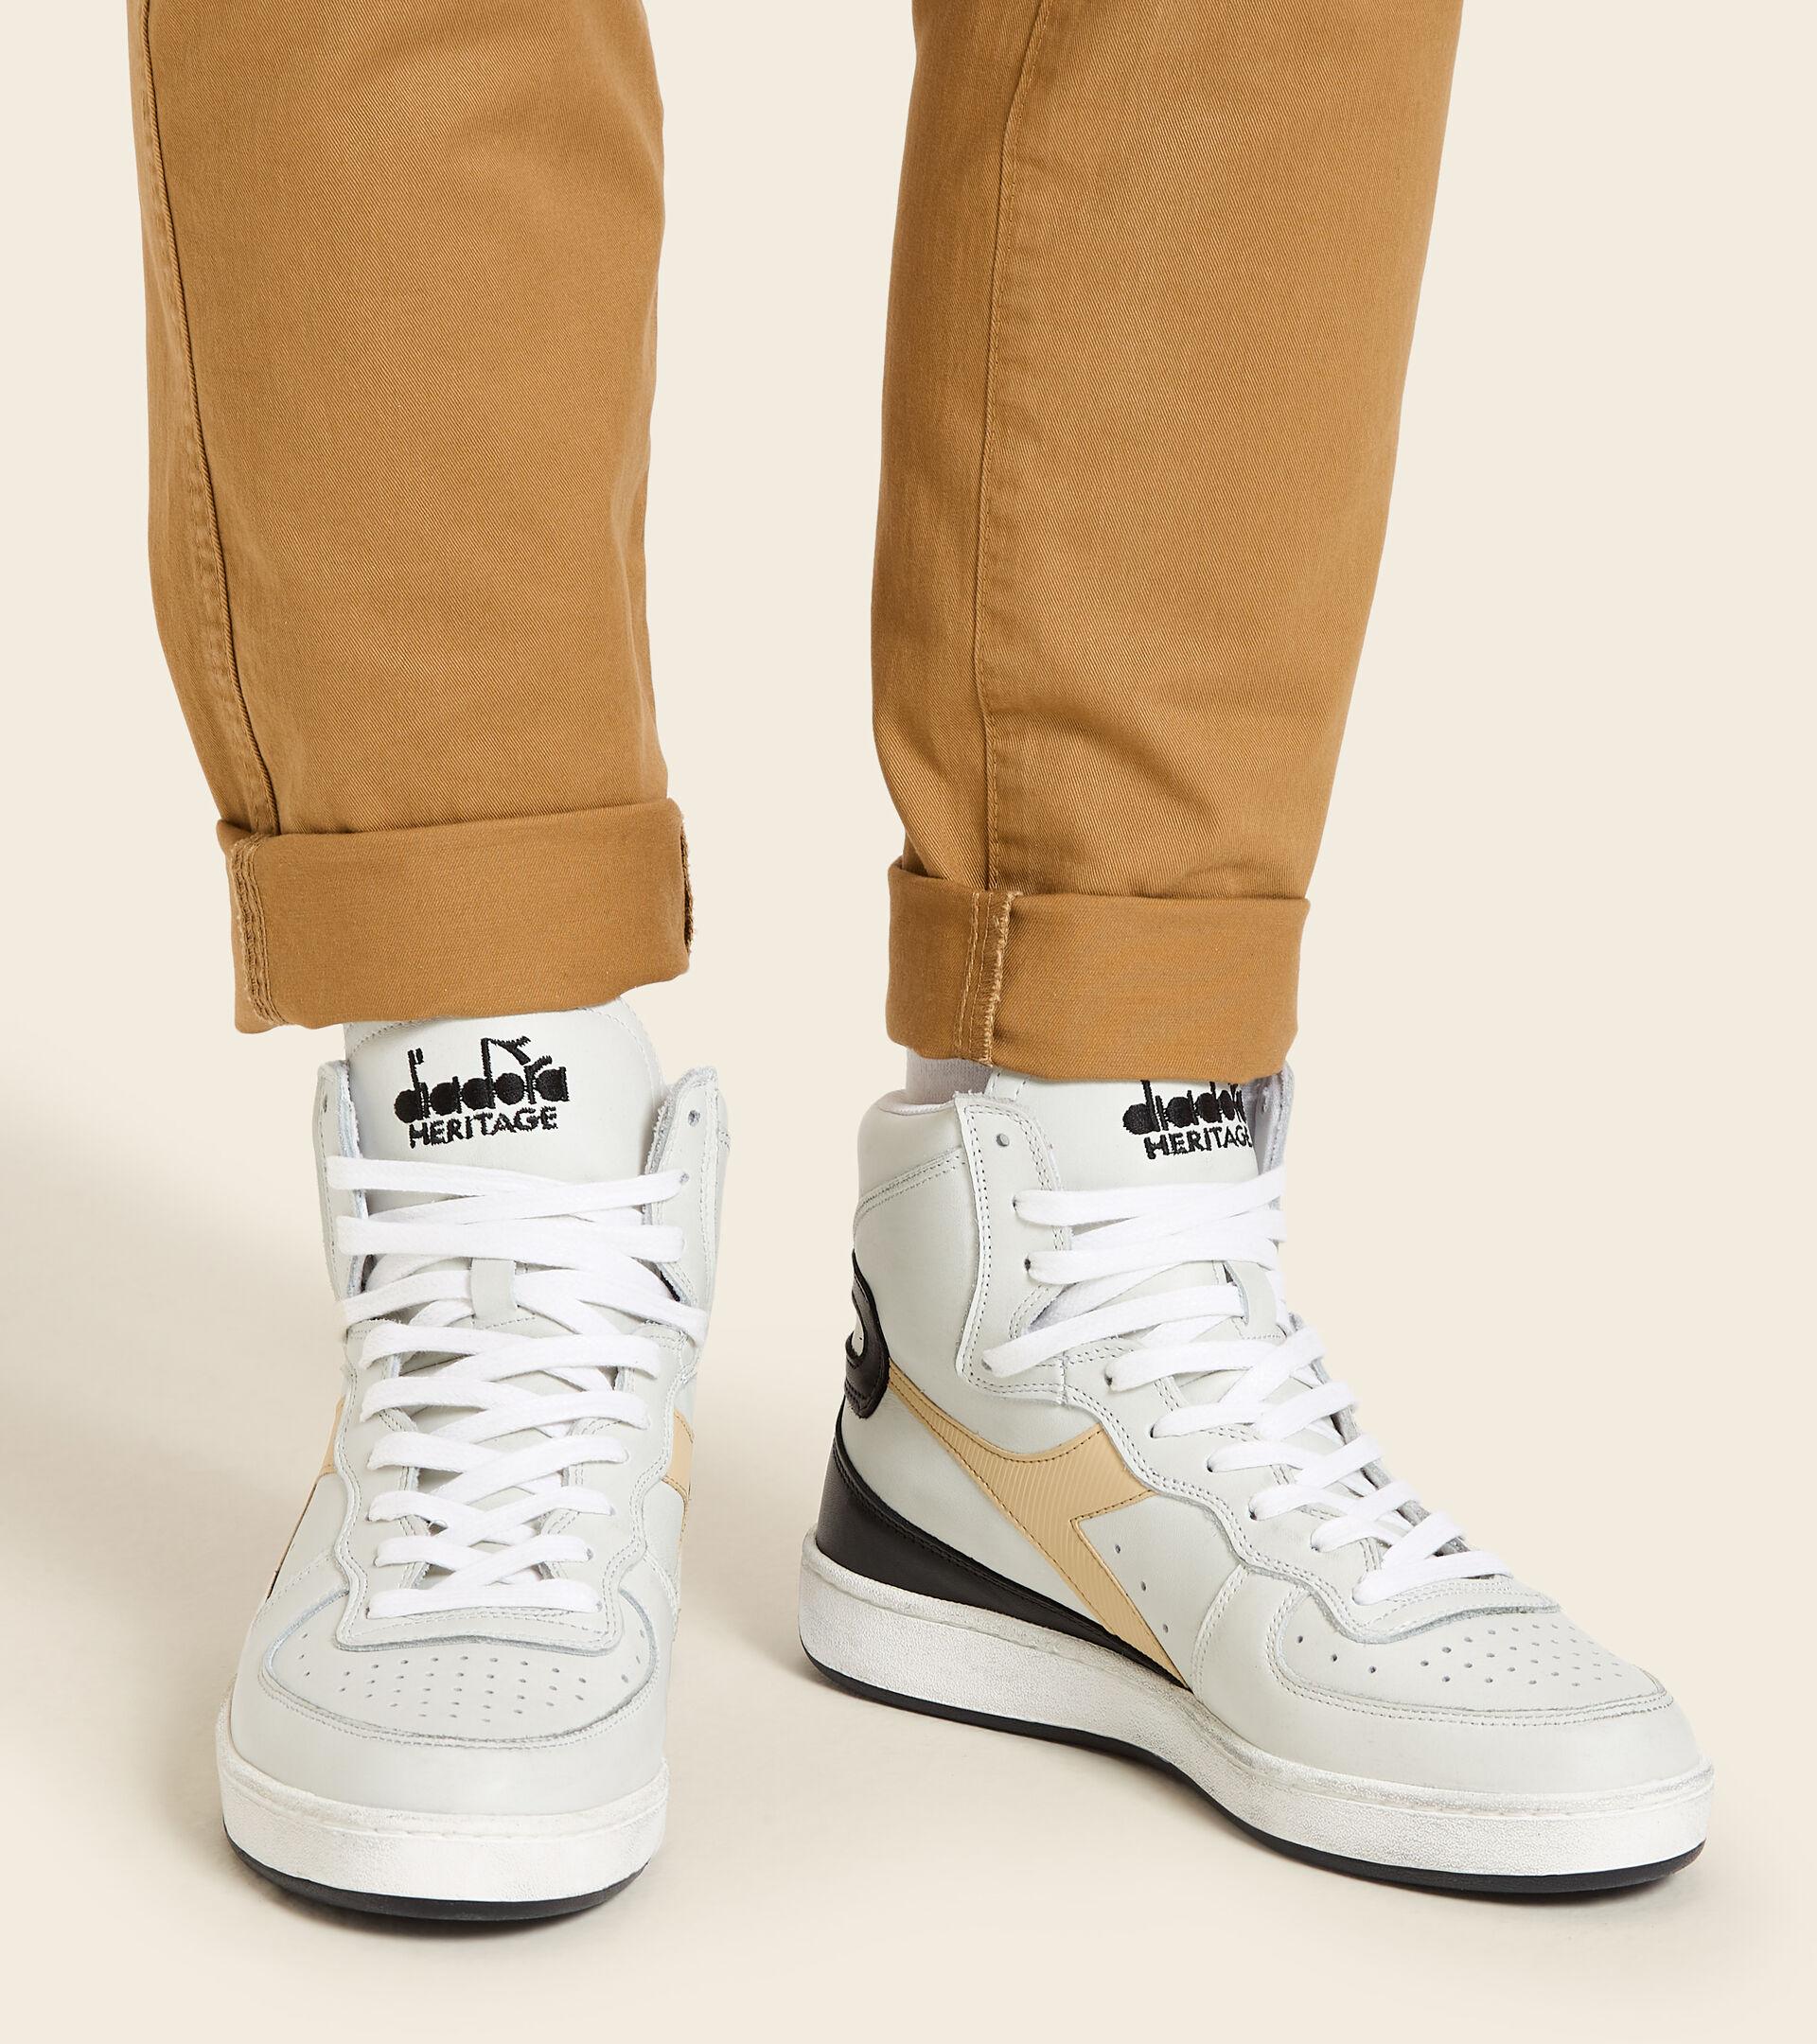 Footwear Heritage UNISEX MI BASKET USED BIANCO/BEIGE TE CHAI Diadora